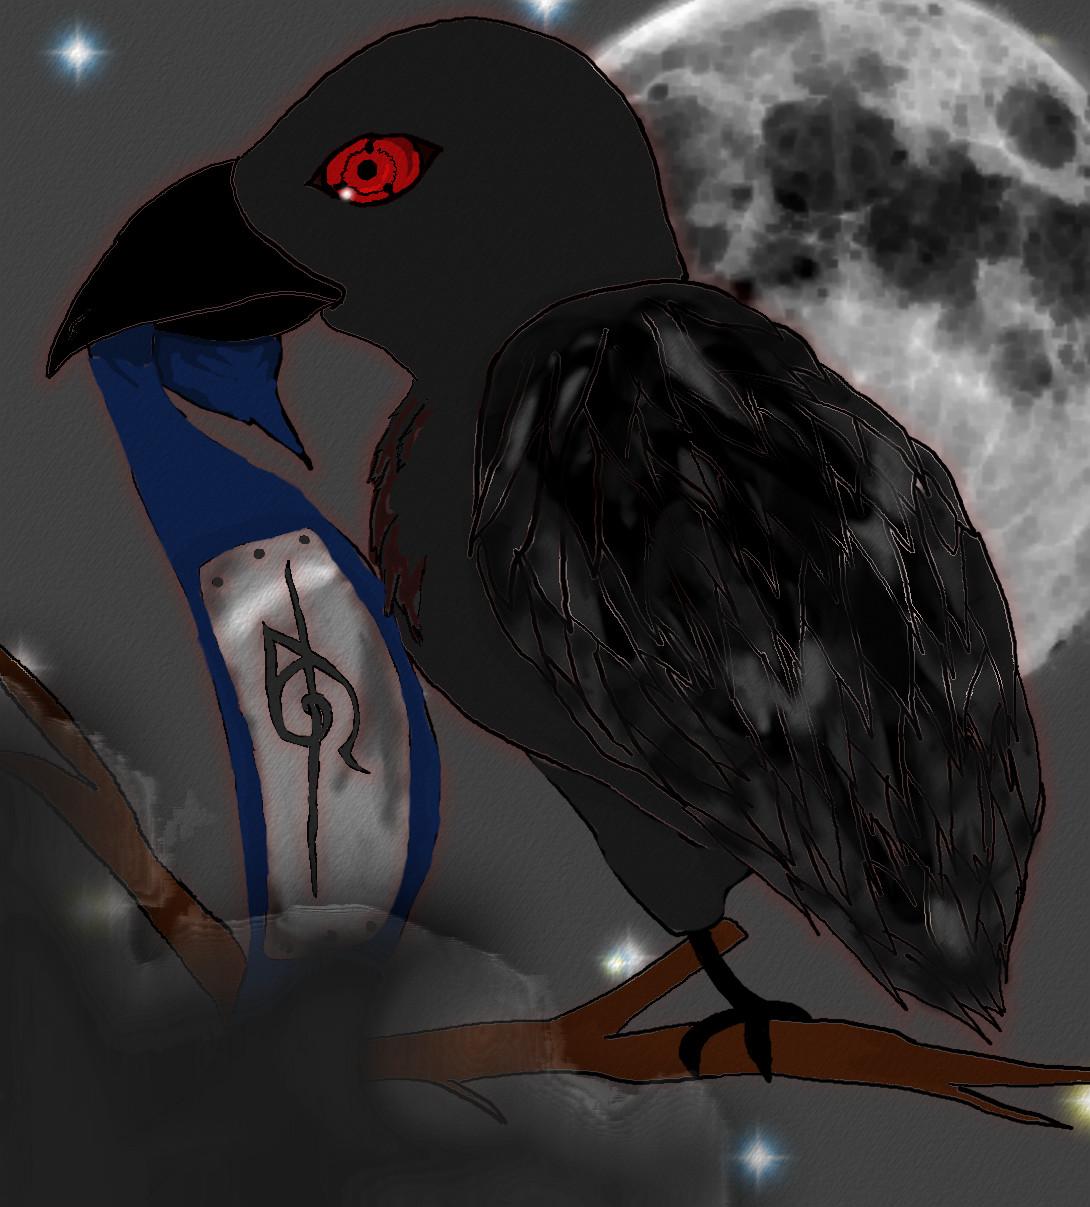 Itachi's Crow by AnbuGirl26 on DeviantArt